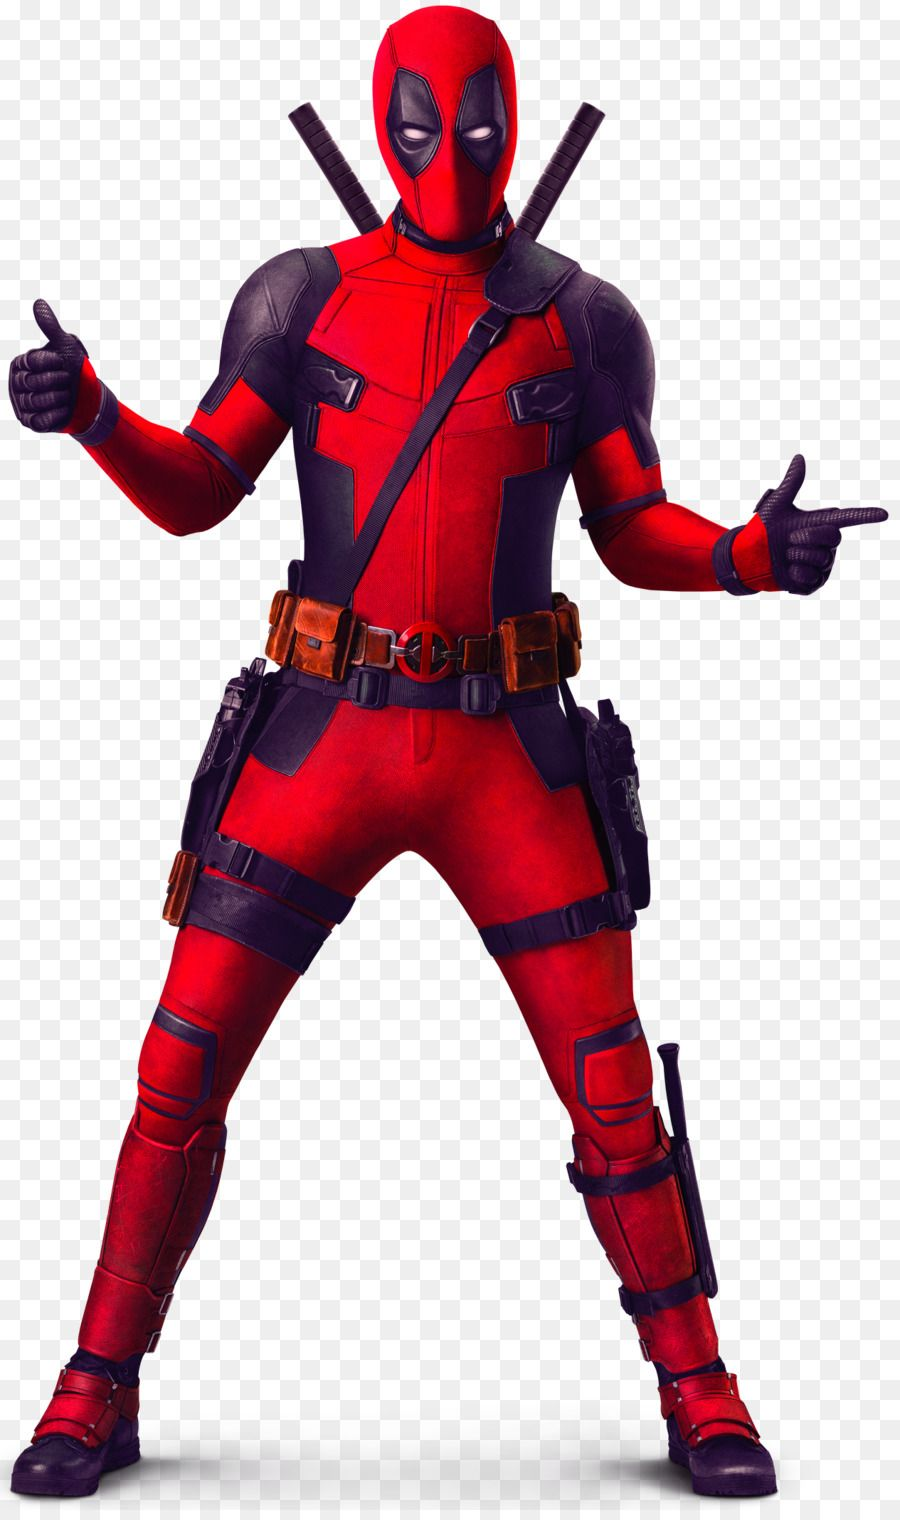 Deadpool Blu Ray Disc Film Marvel Comics Teaser Campaign Deadpool Unlimited Download Kisspng Com Wolverine Quadrinhos Deadpool Super Heroi